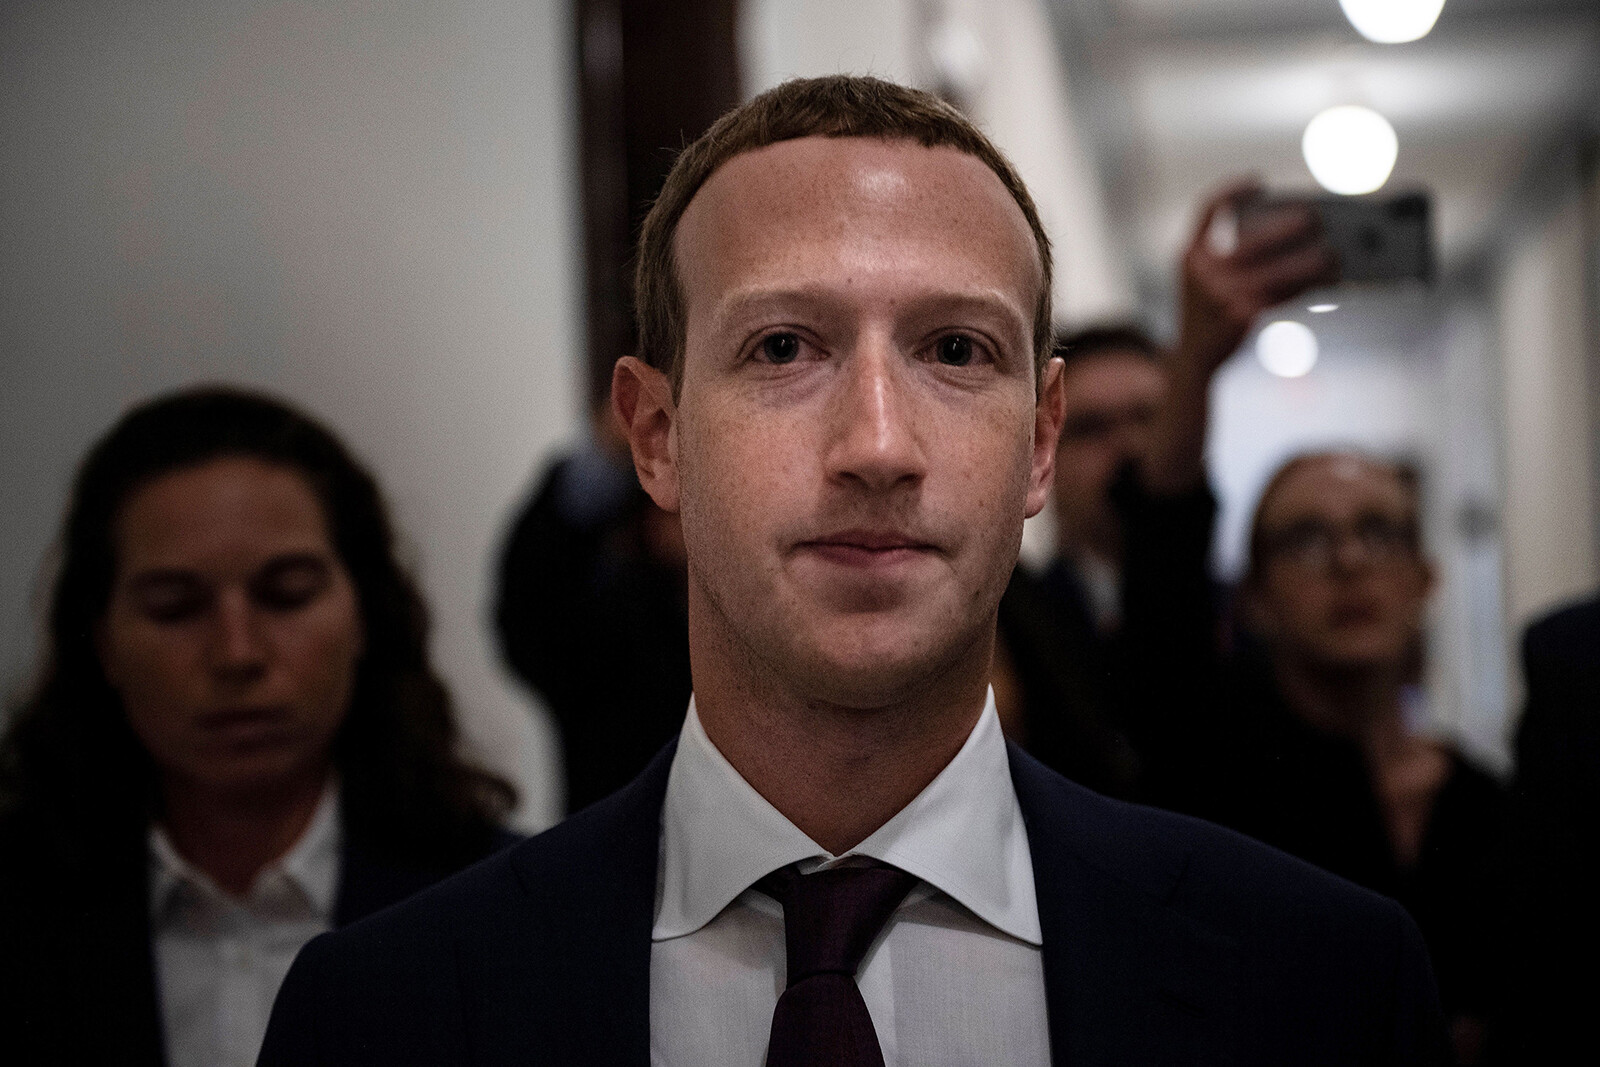 Fact-checking Zuckerberg's statement defending company